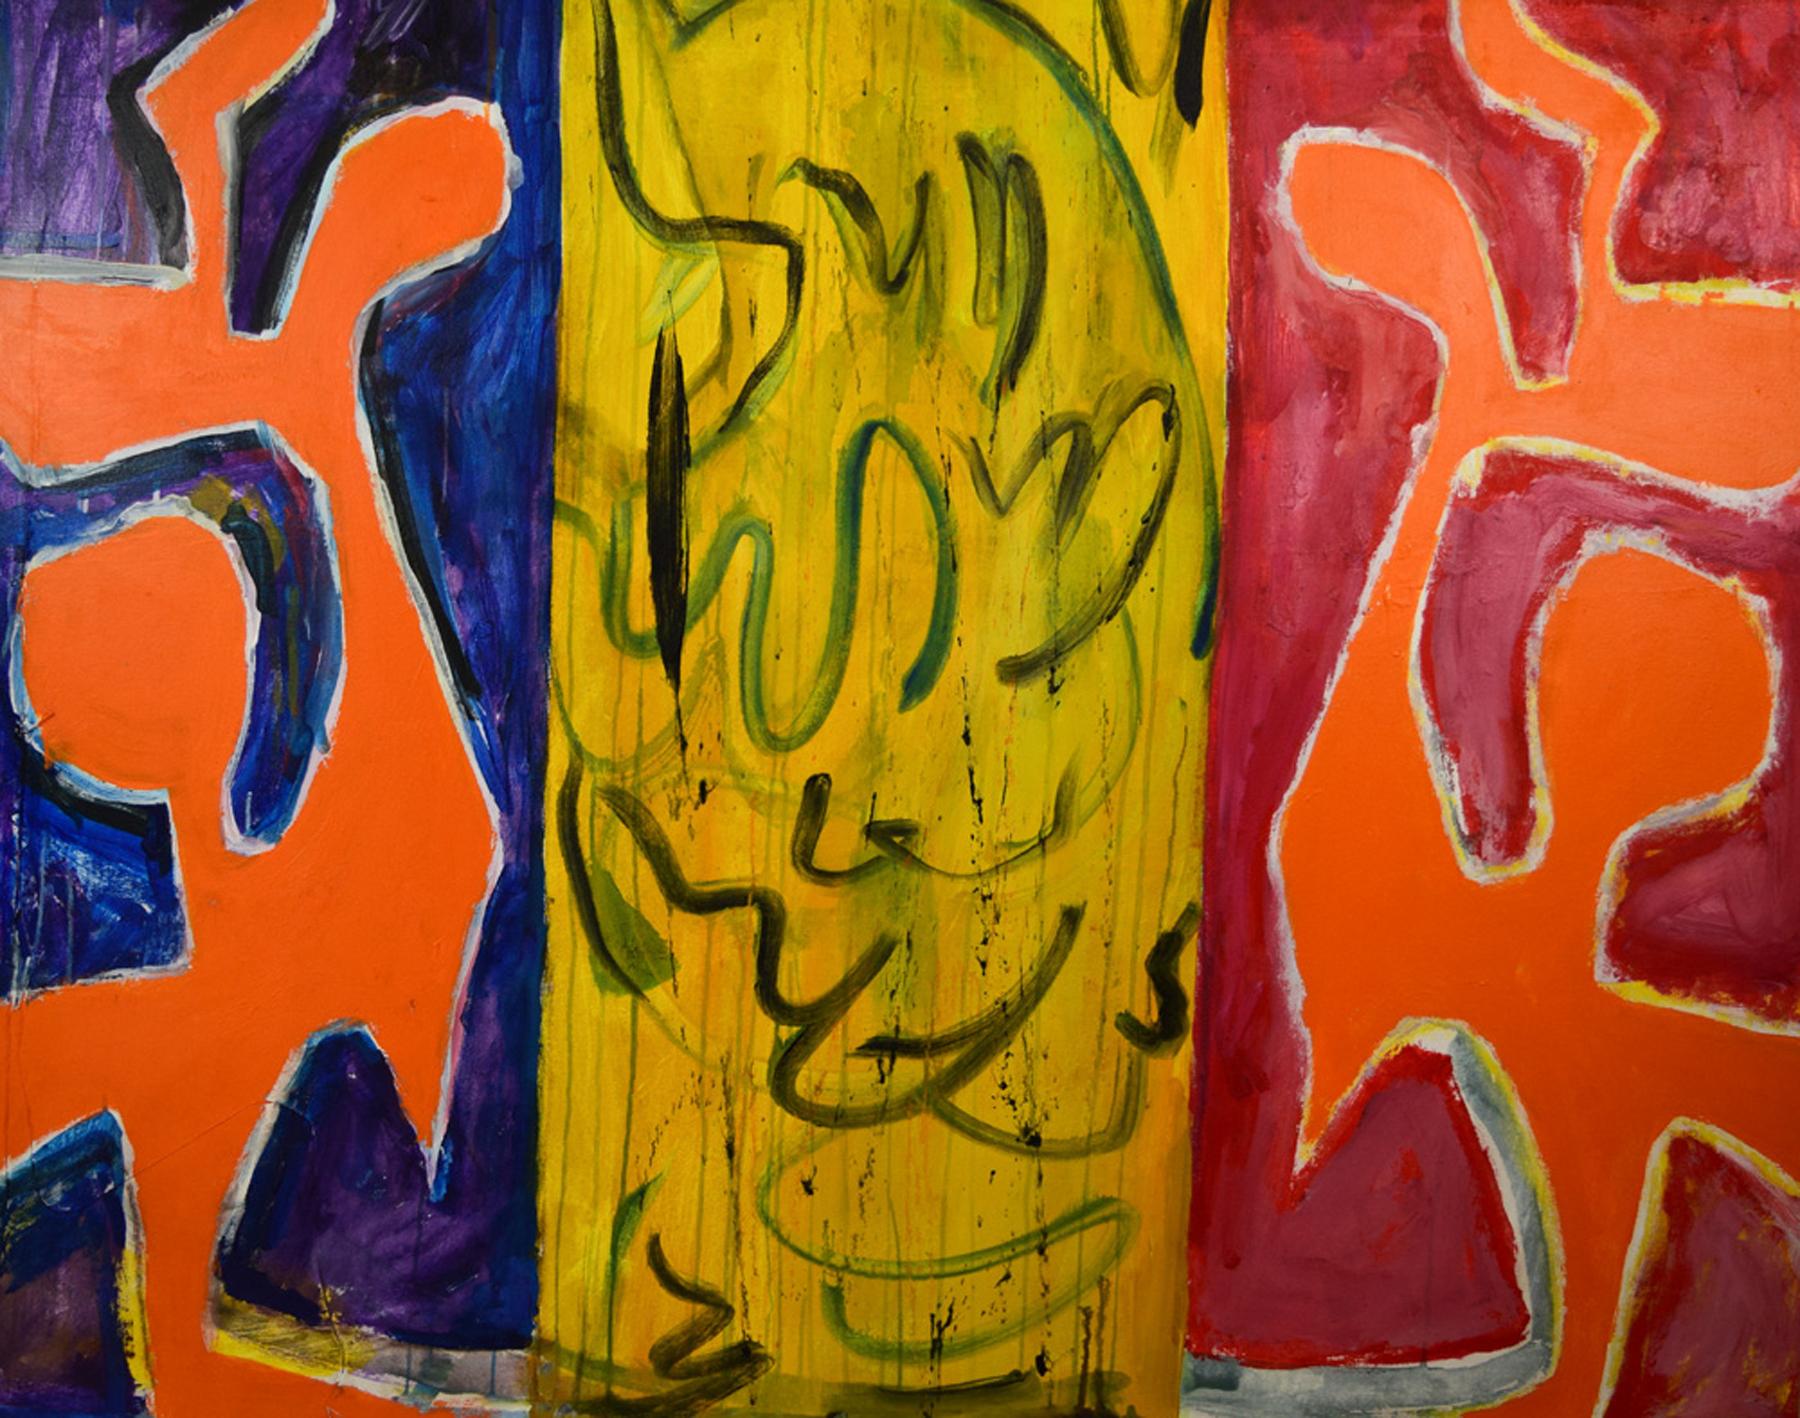 Split , 2003. Acrylic on canvas, 44 x 55 in. (112 x 140 cm.)